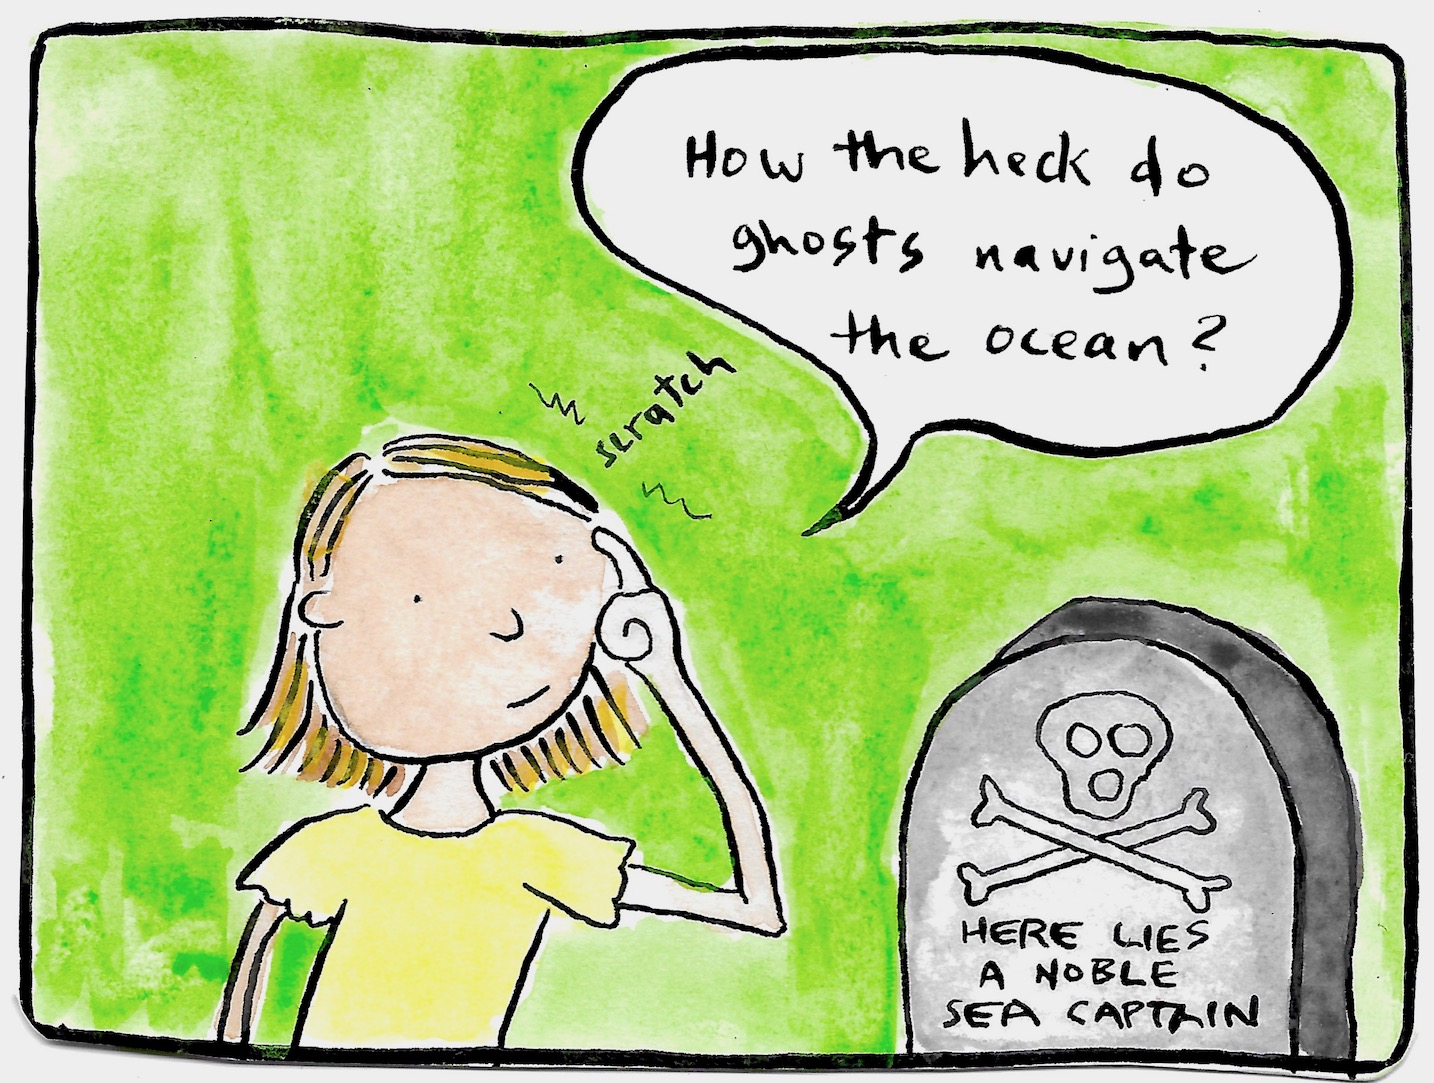 Sea Captain Tombstone